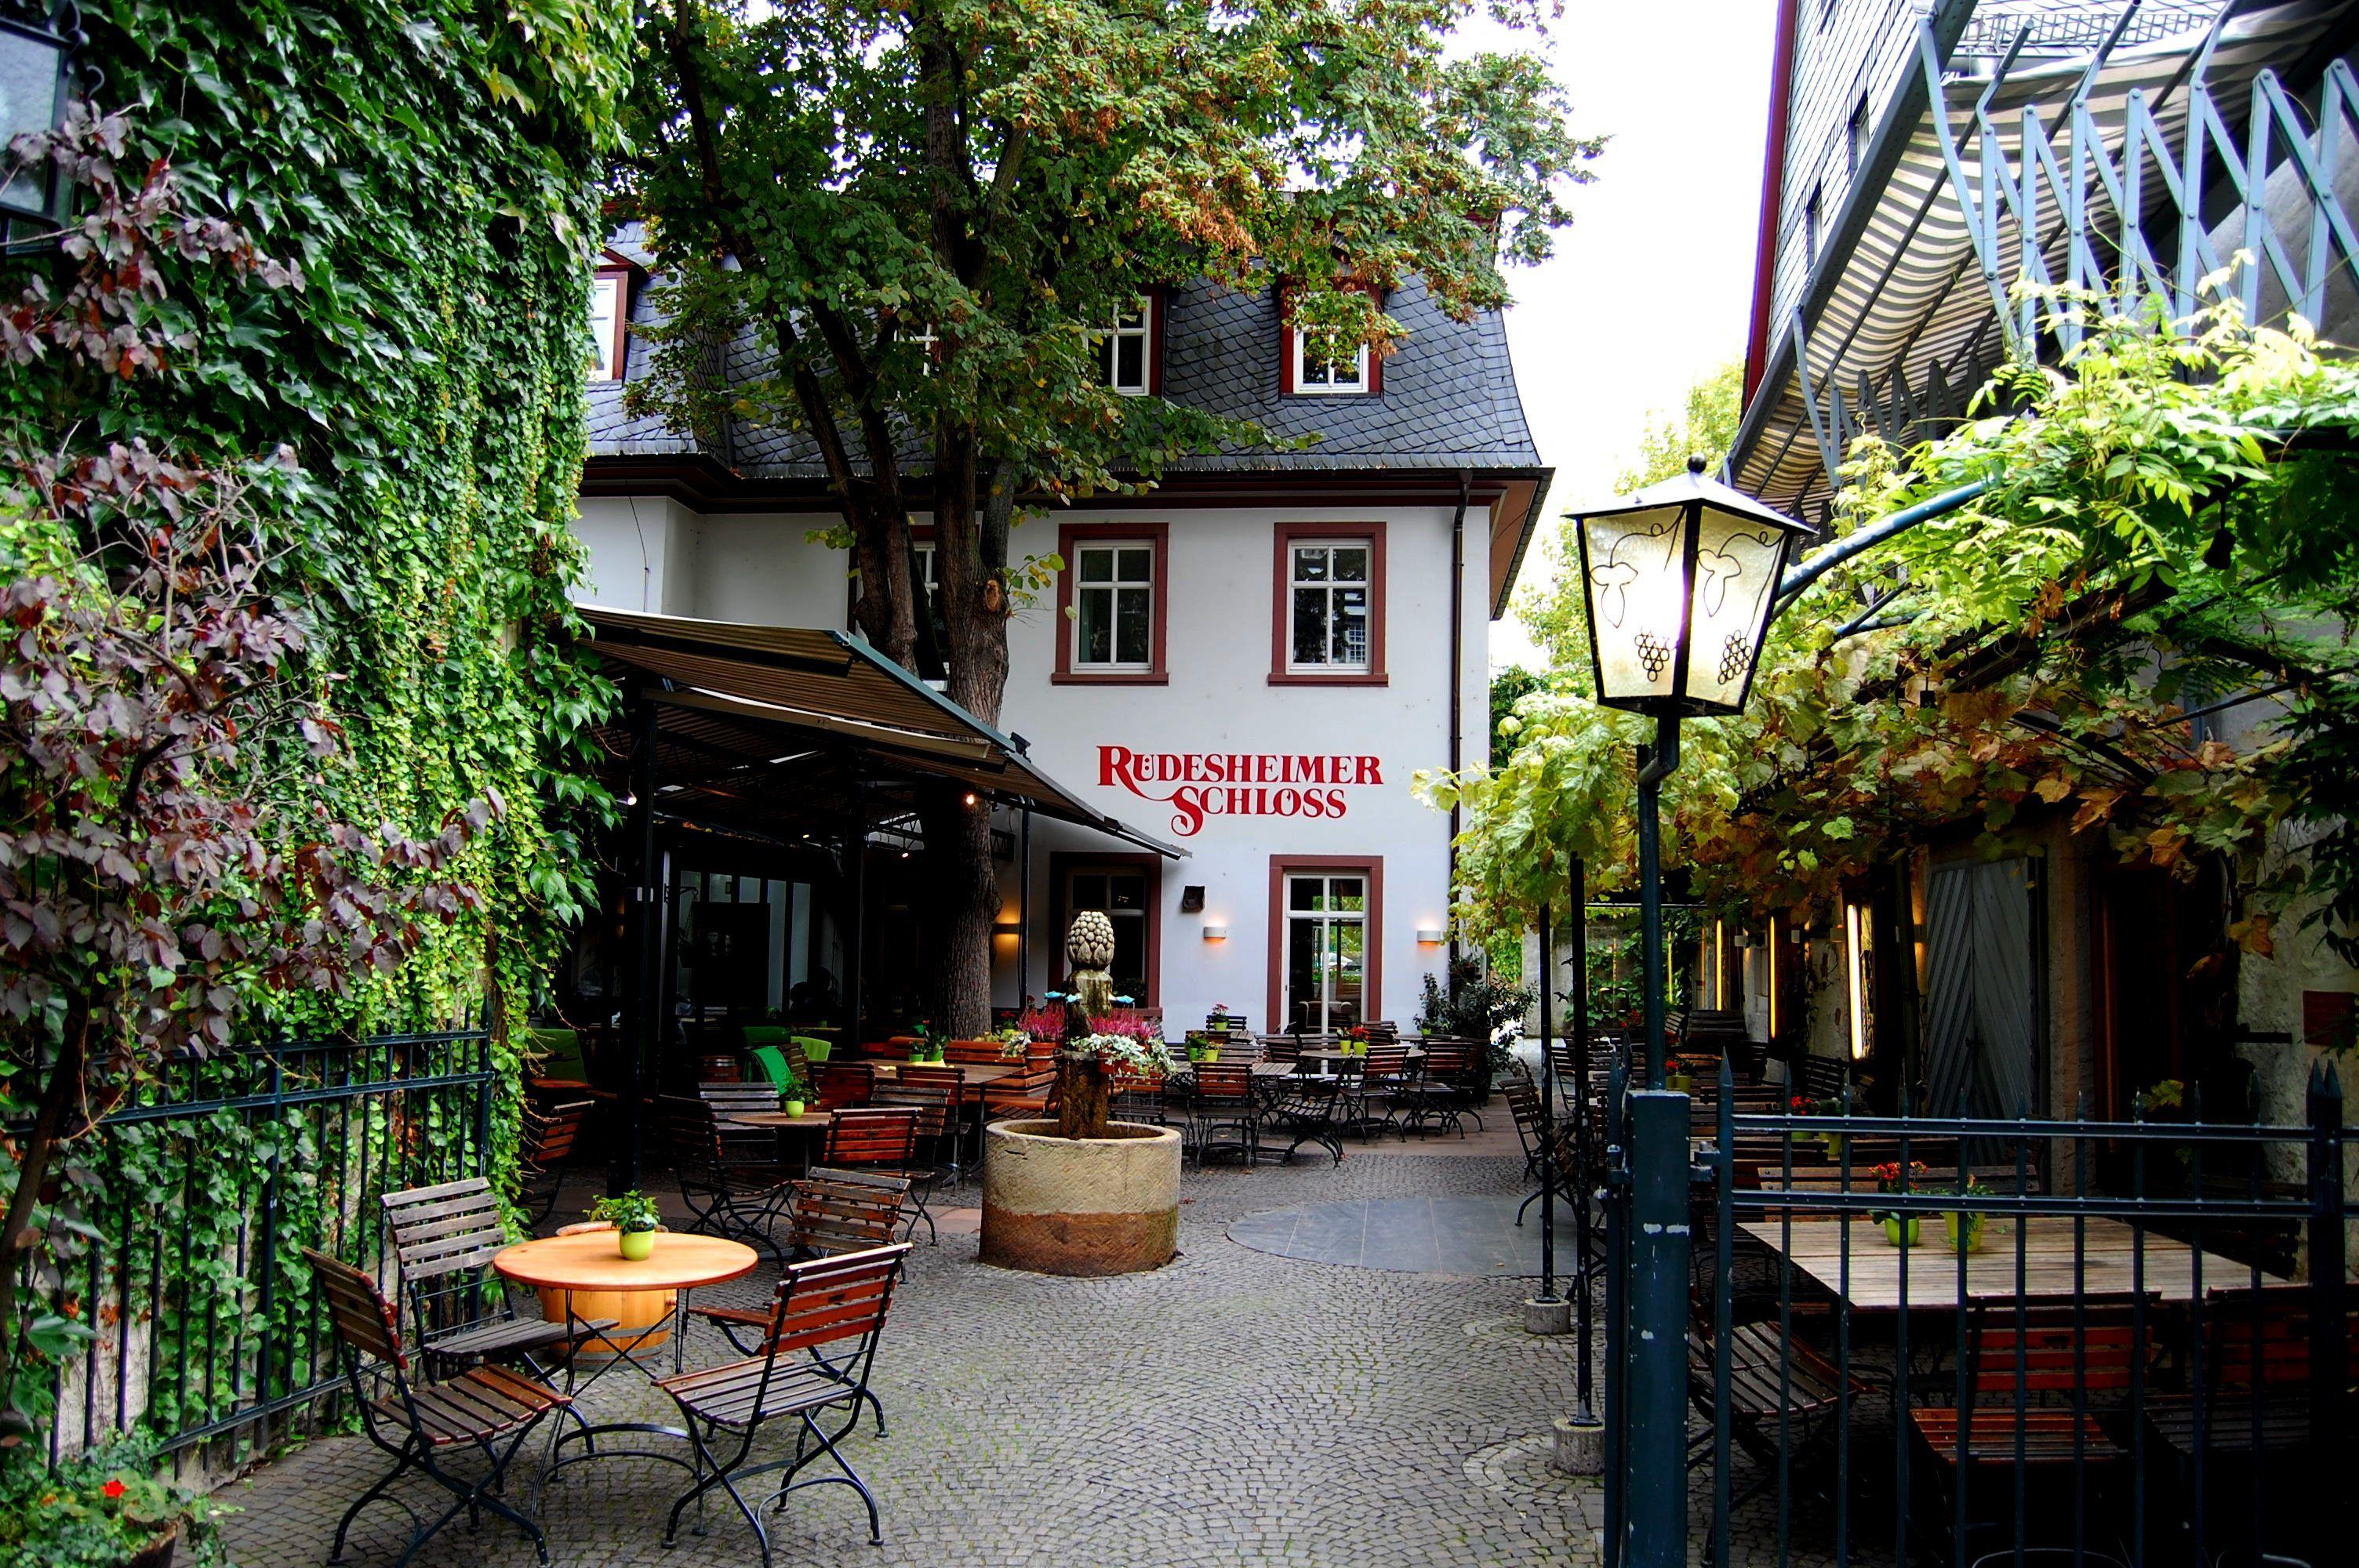 rudesheim germany germany i miss you pinterest regensburg travel memories and bavaria. Black Bedroom Furniture Sets. Home Design Ideas